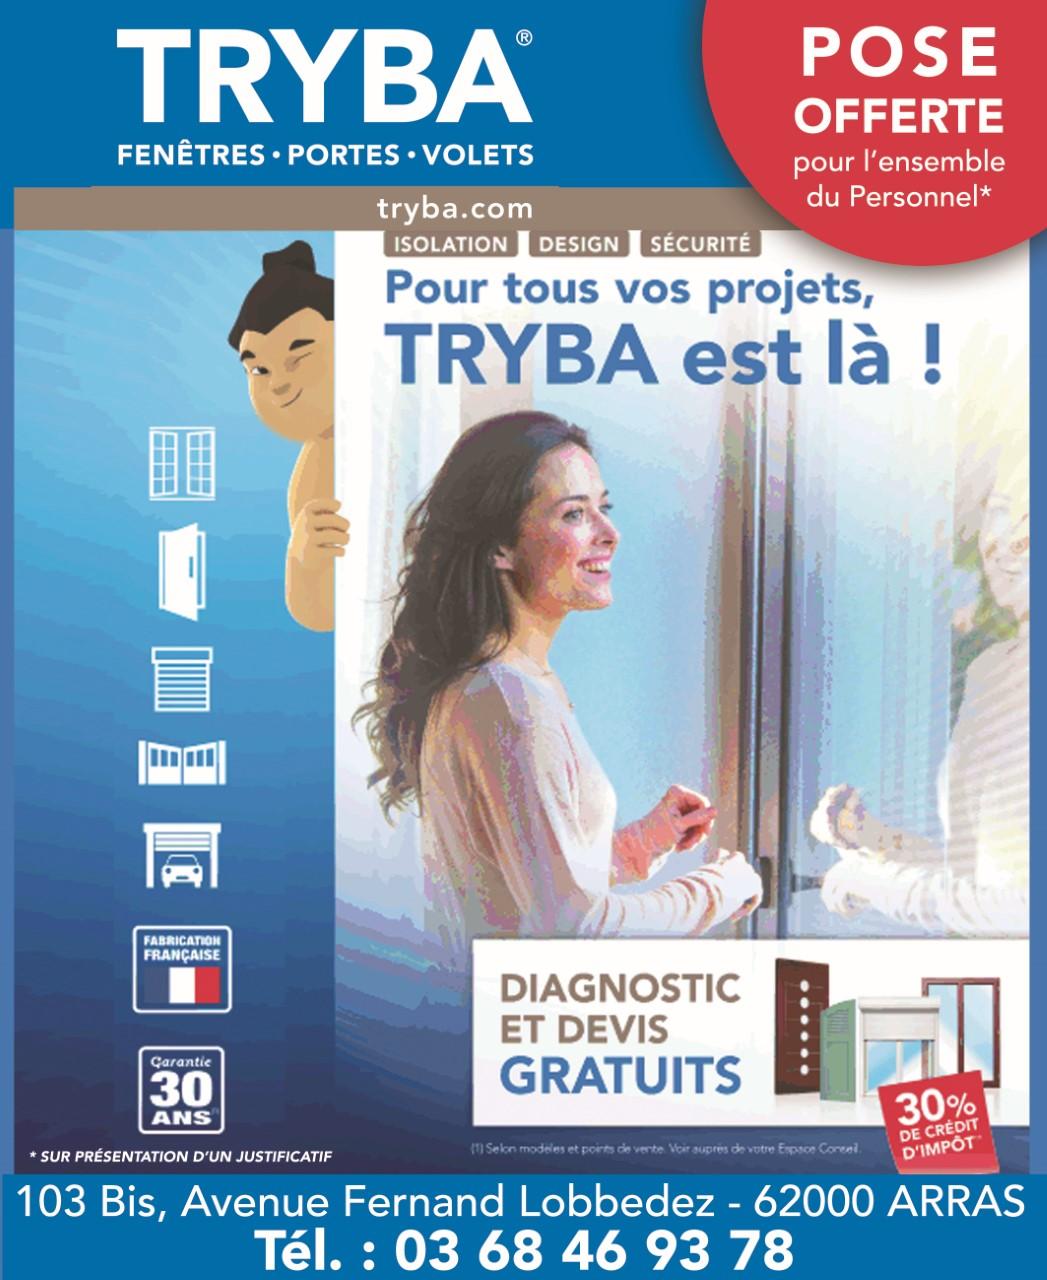 Tryba - Arras  - Pose de la fenêtre offerte